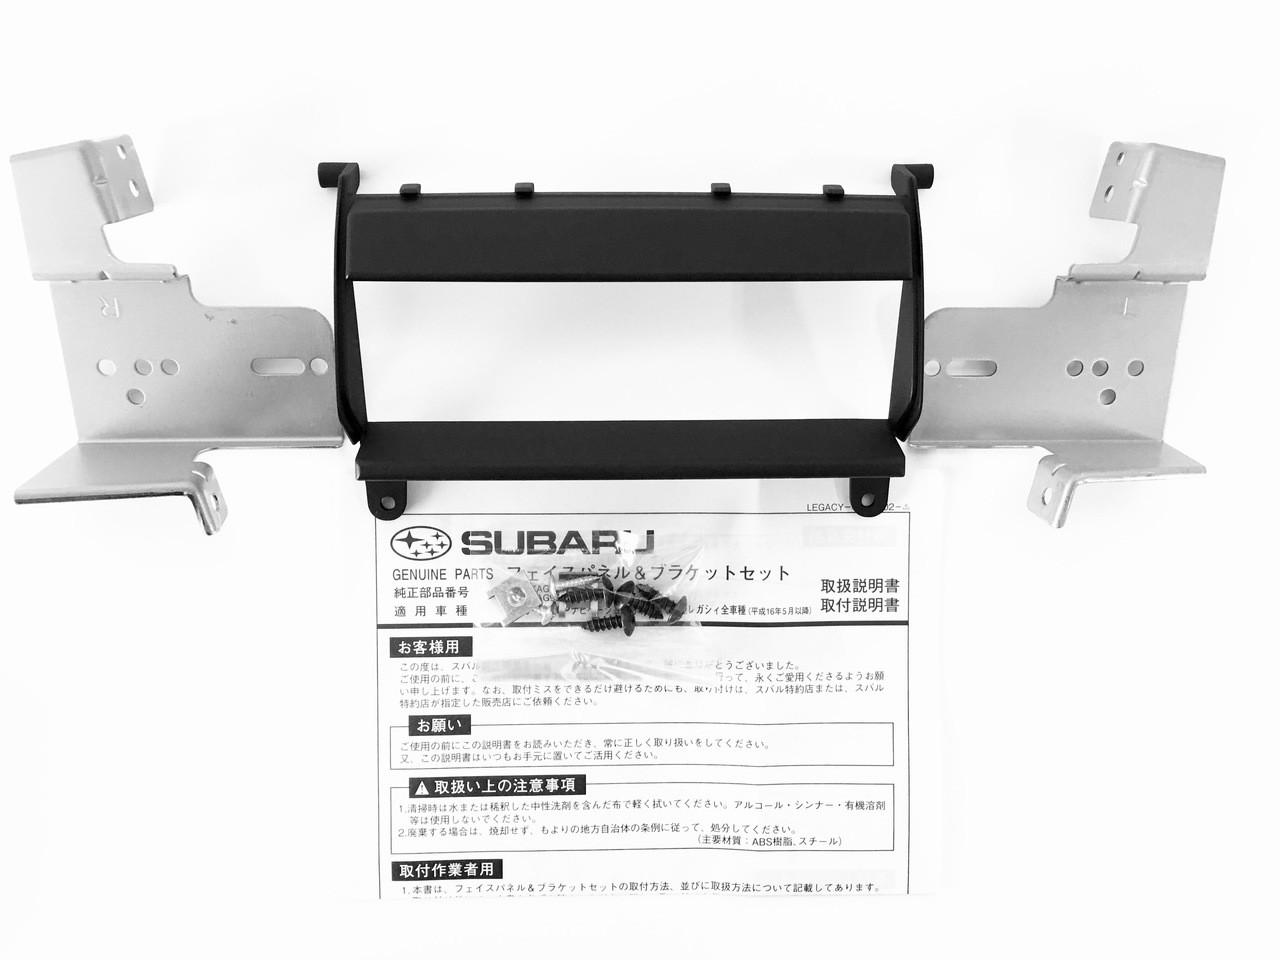 Subaru JDM Single Din Console Panel Adapter H0017AG920 set contents at AVOJDM.com